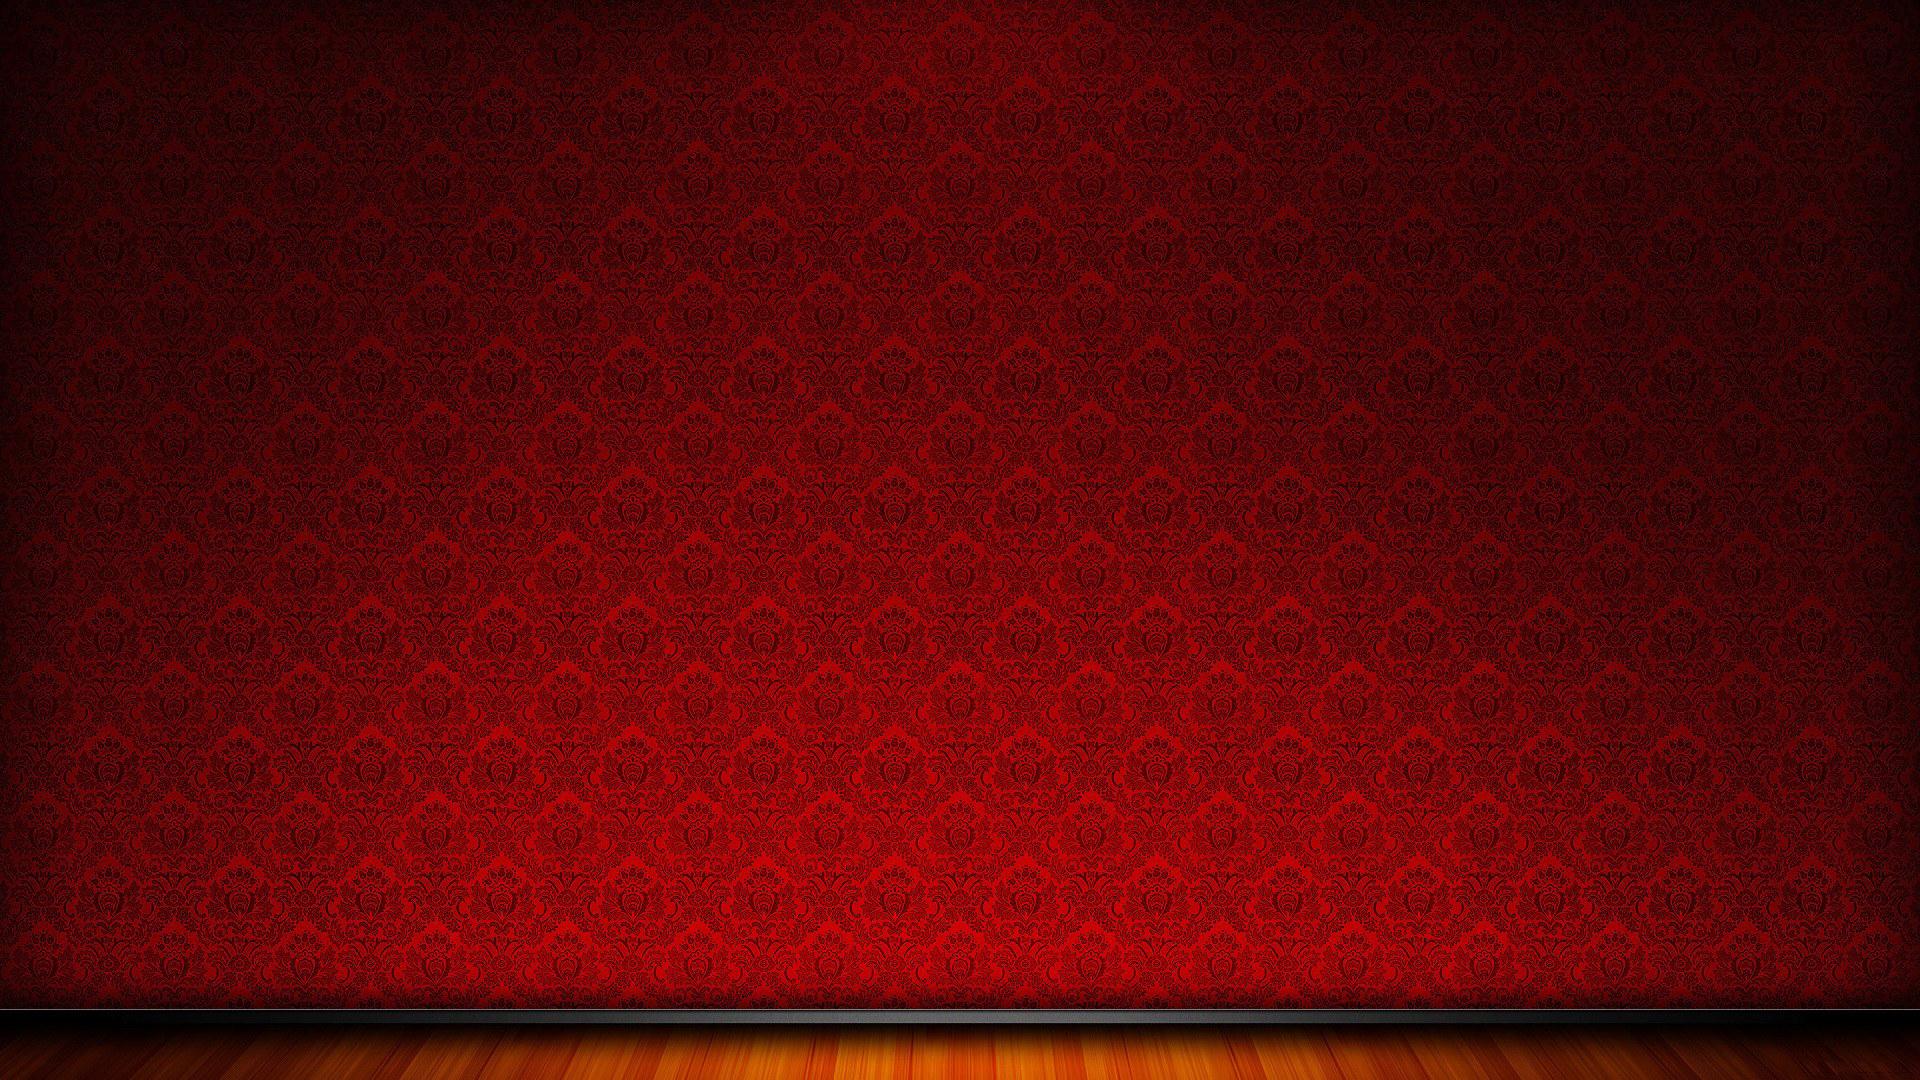 http://1.bp.blogspot.com/-AOPYIZzfGVE/Tk6qB6_2sXI/AAAAAAAAY2g/8ivcuOW_Kq4/d/Full+HD+Wallpapers+1920x1080+%252831%2529.jpg